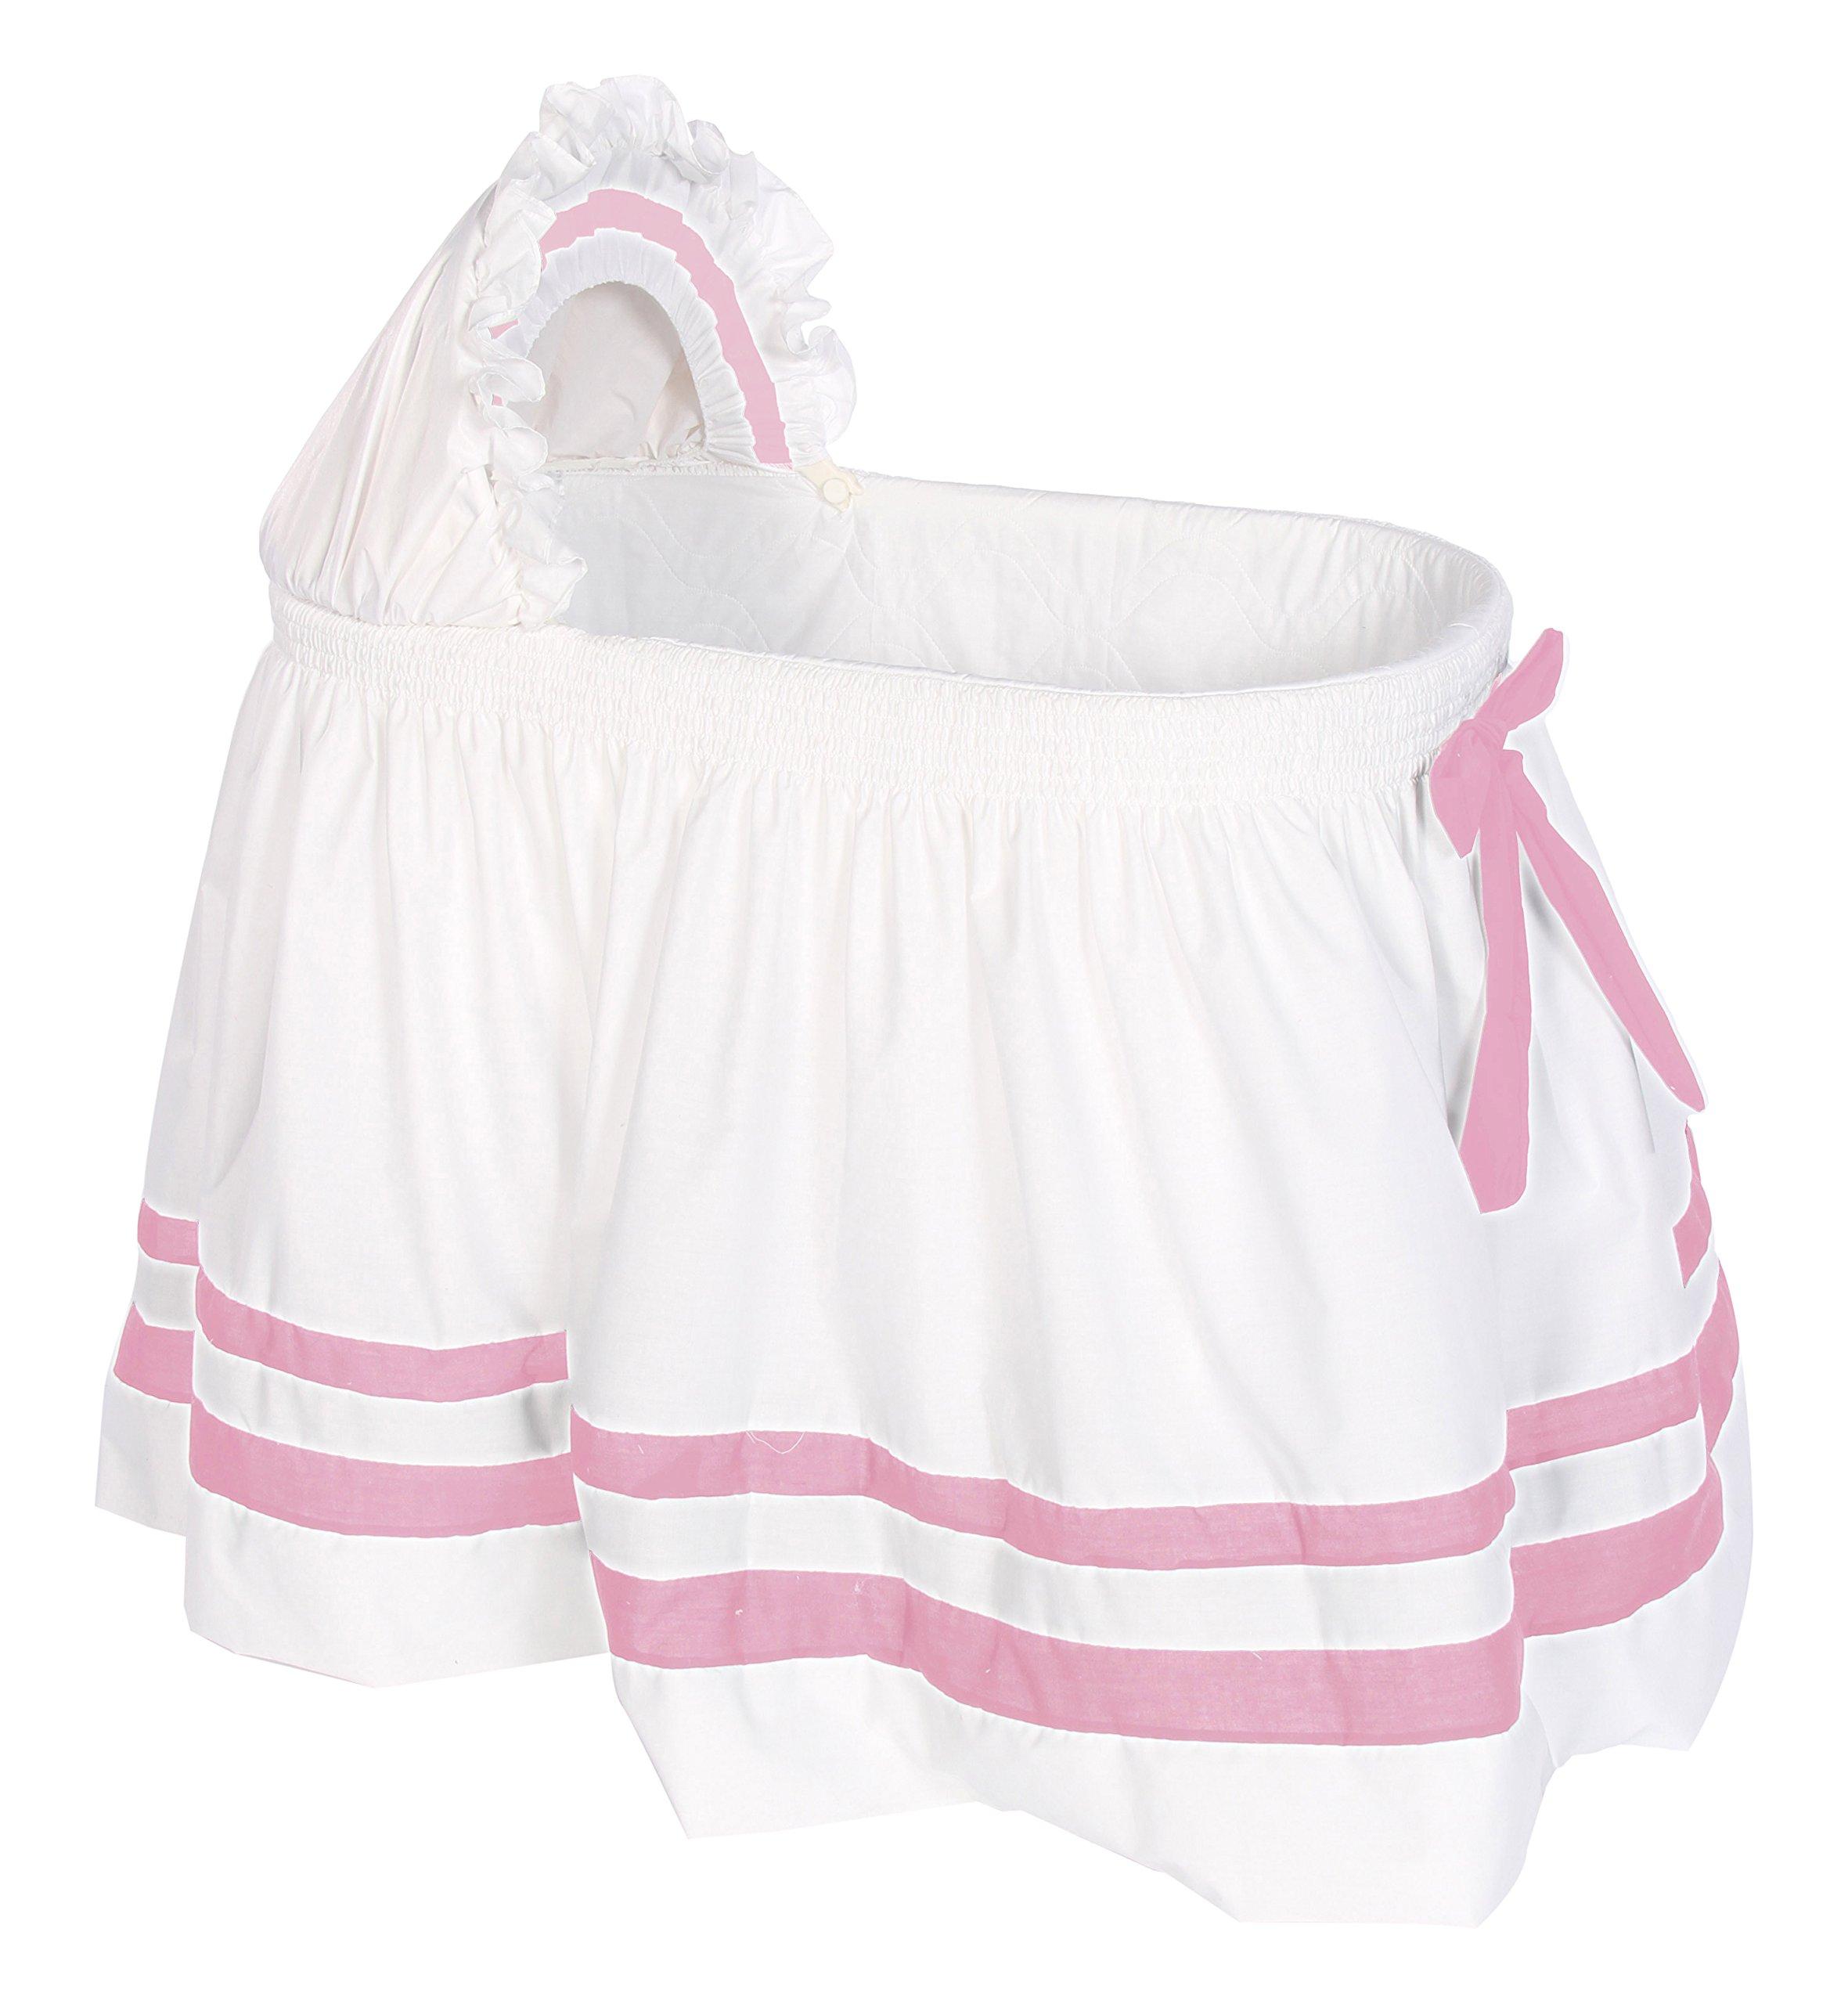 Baby Doll Bedding Modern Hotel Style II Bassinet Skirt, Pink by BabyDoll Bedding